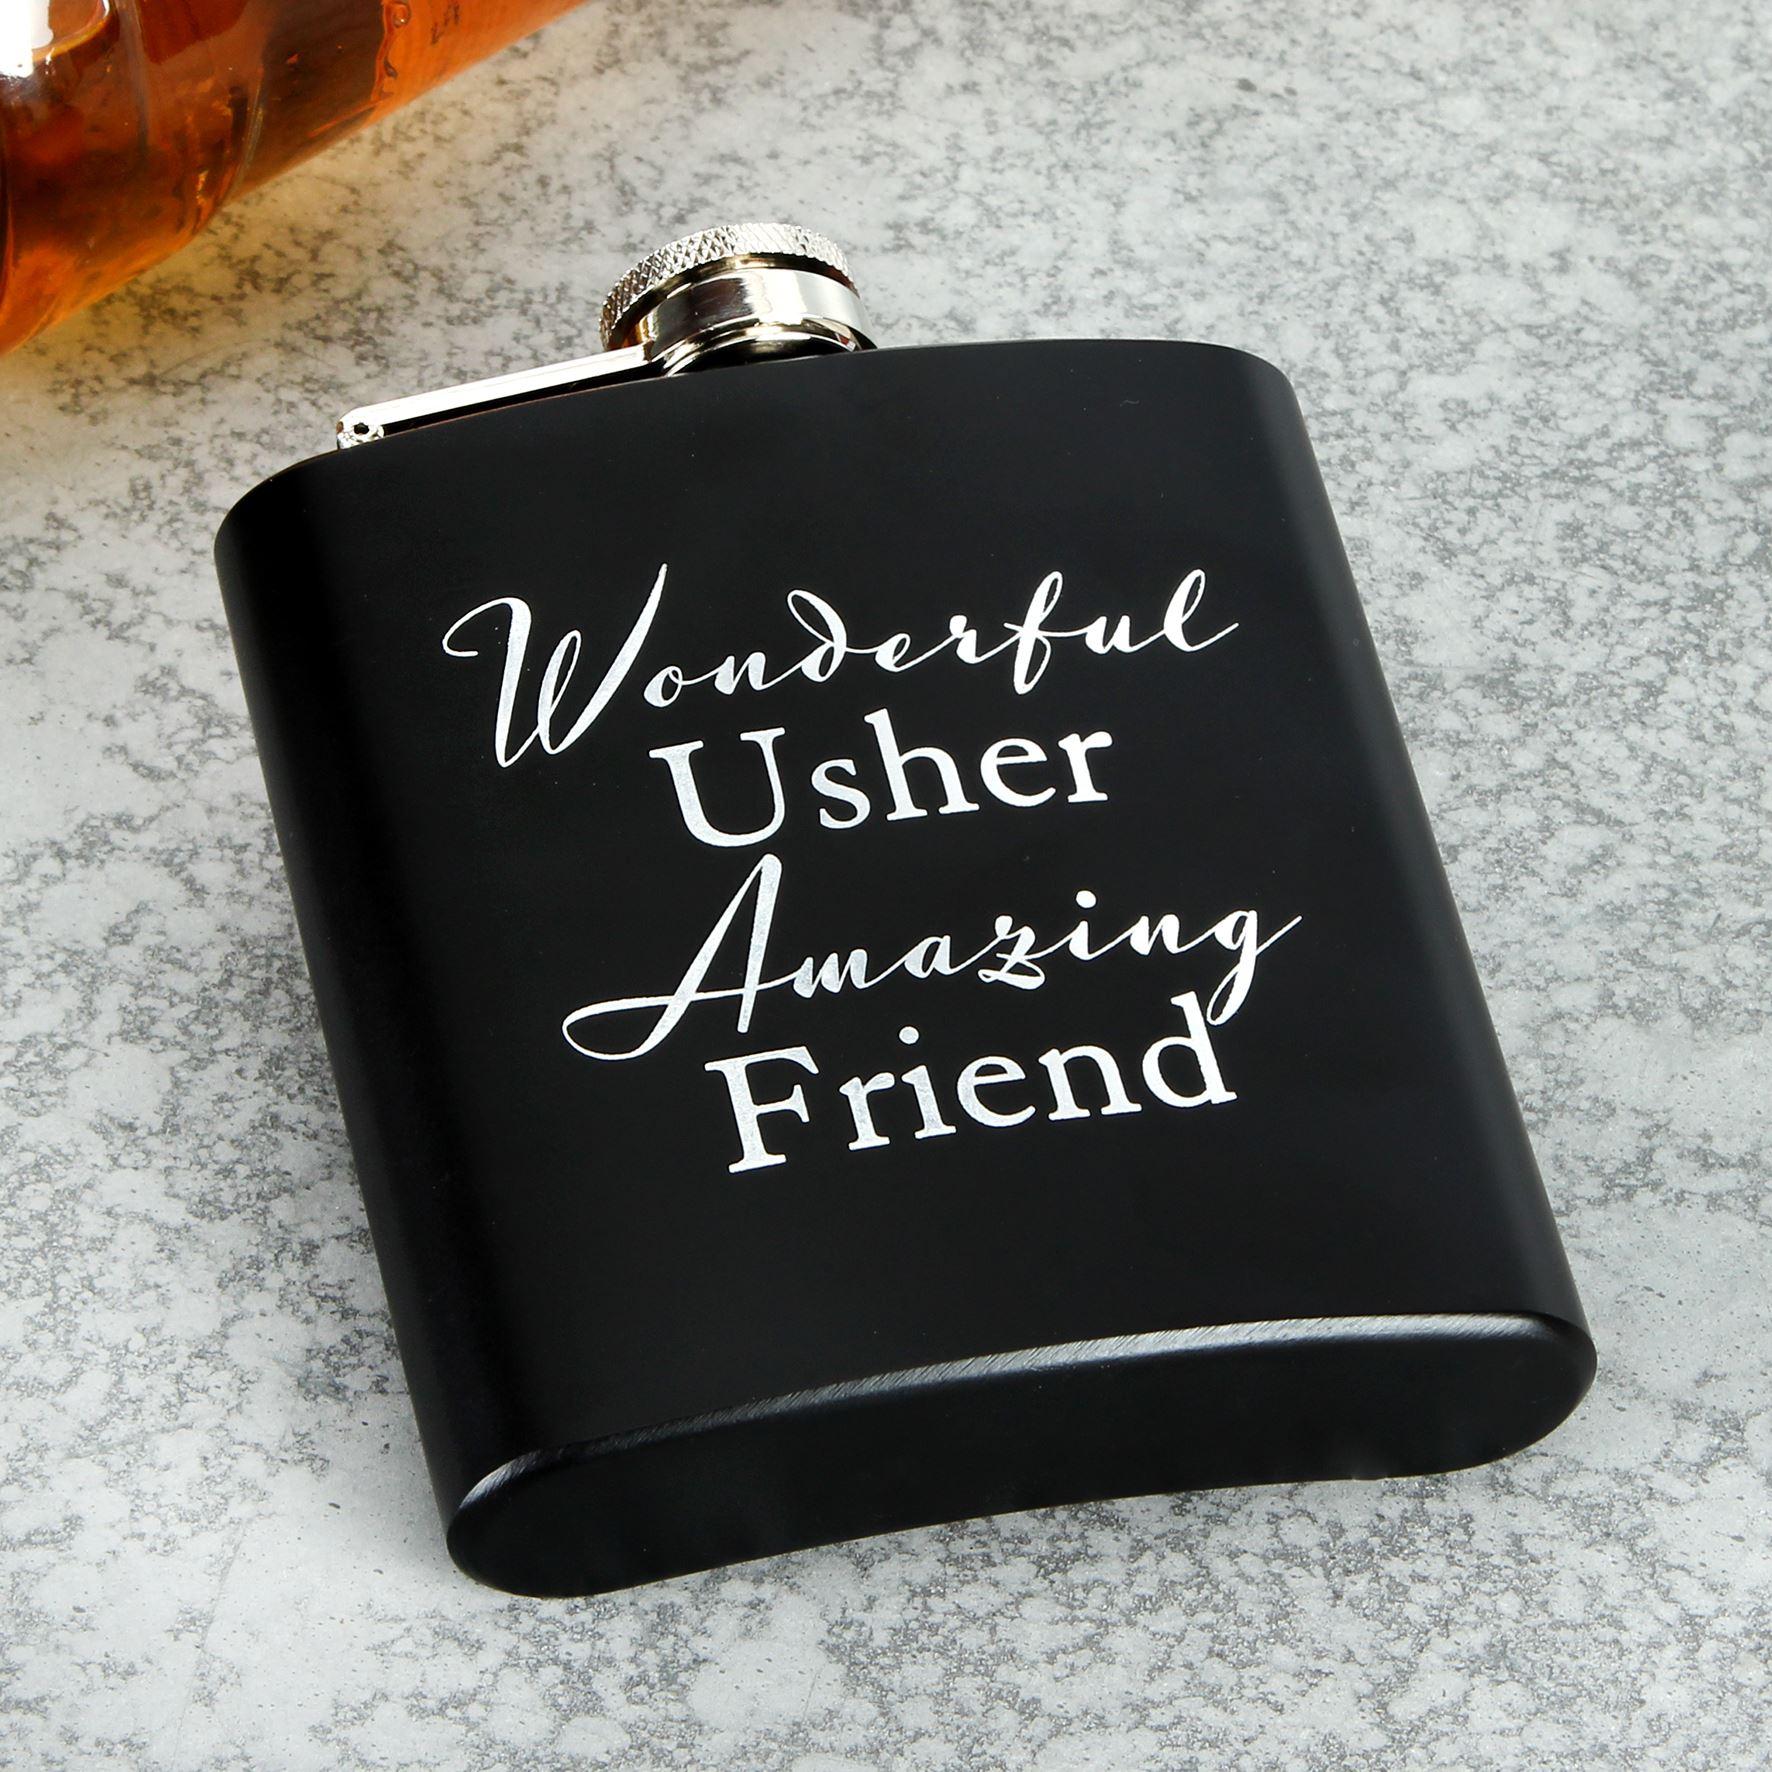 Amore 6Oz Hip Flask - Wonderful Usher